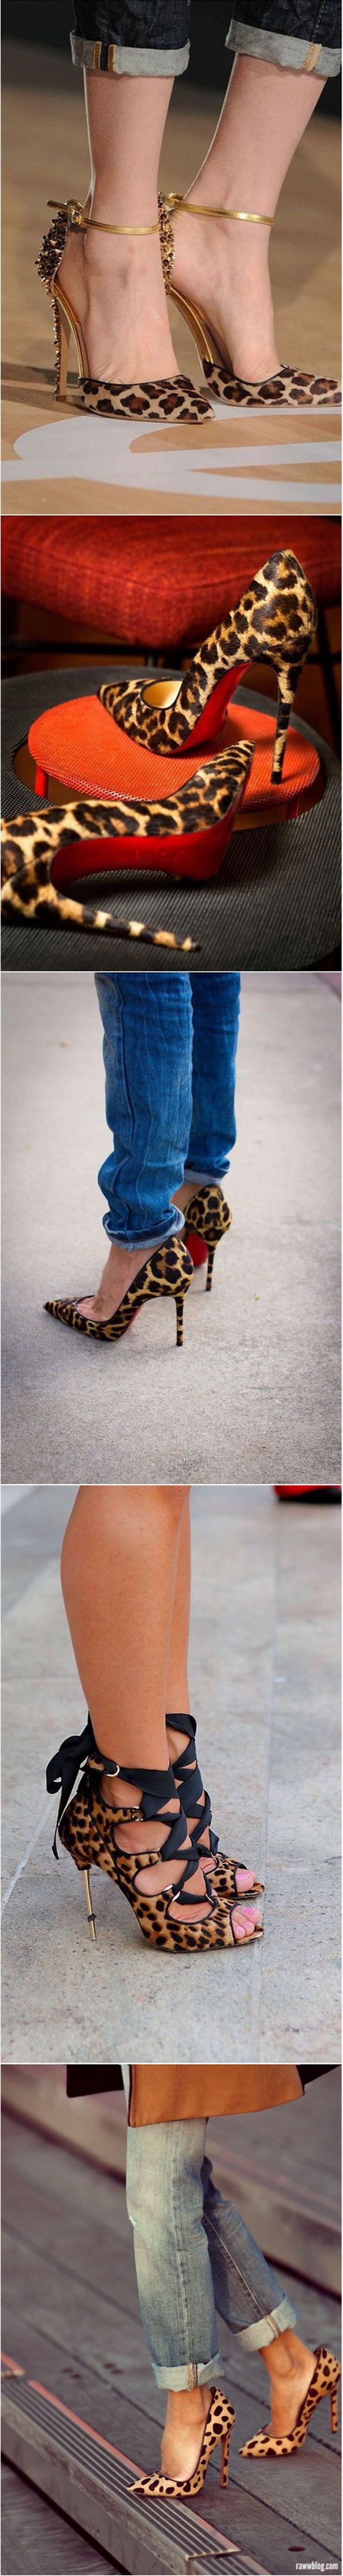 #Leopard print trend #heels #shoes